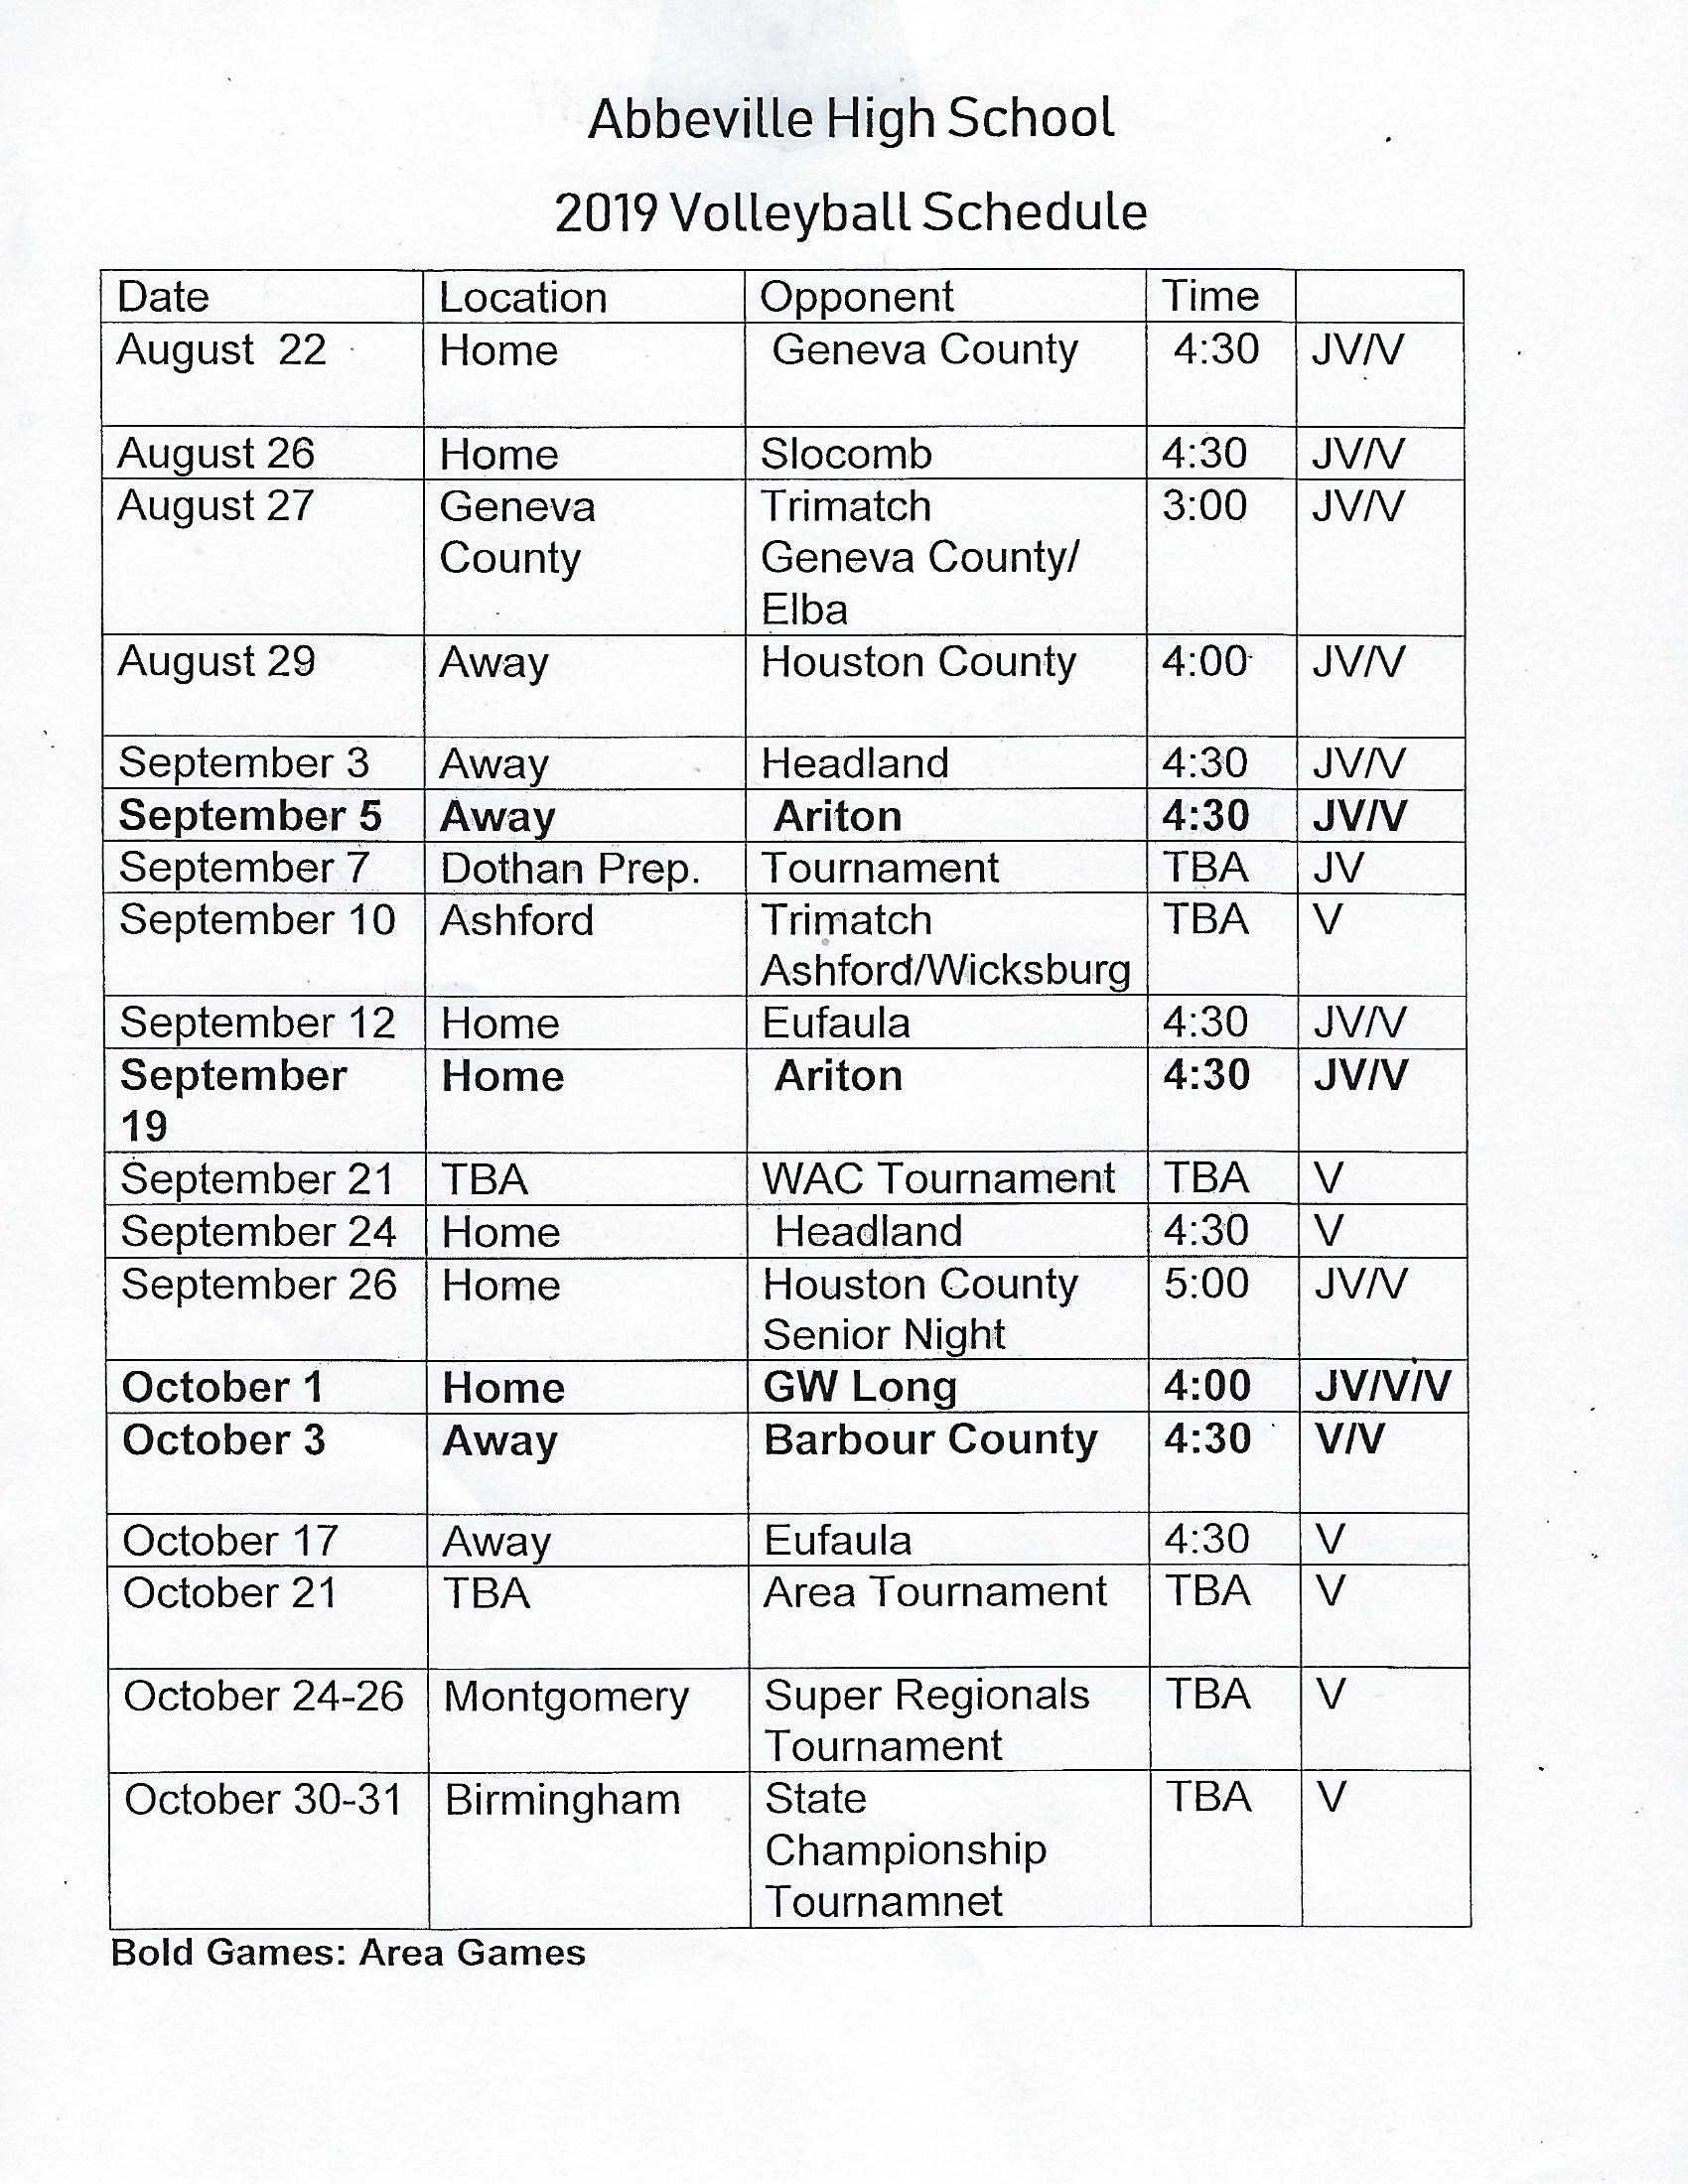 Abbeville High School: Latest News - AHS Volleyball Schedule